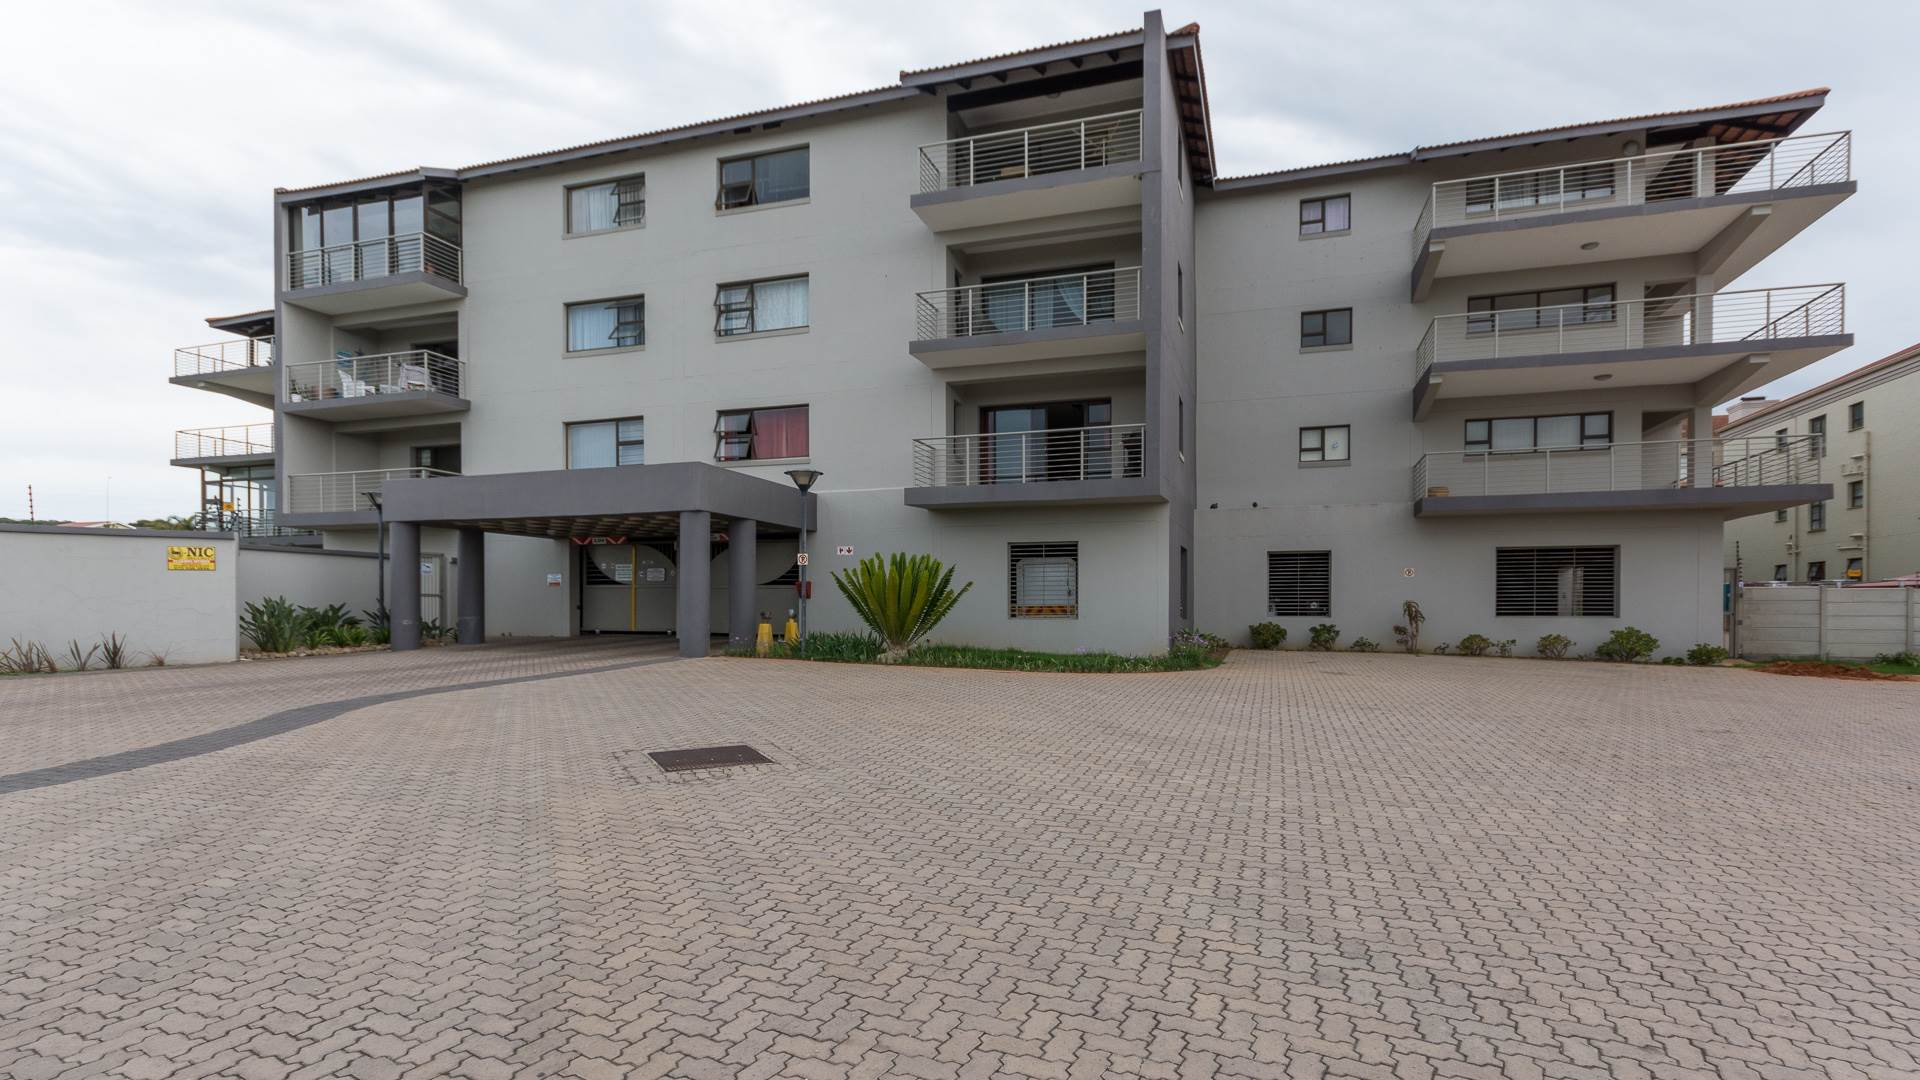 3 BedroomApartment For Sale In Hartenbos